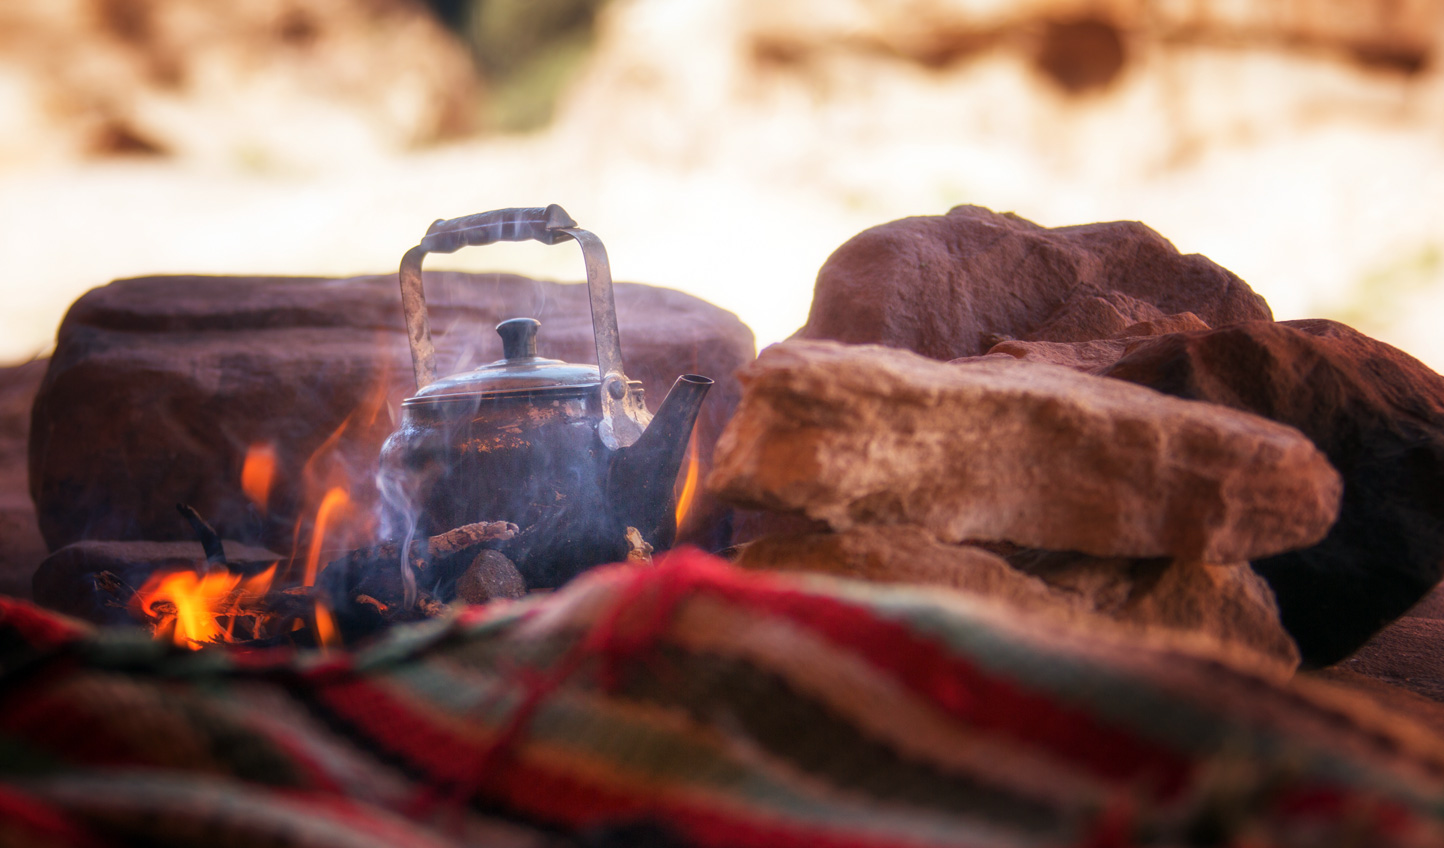 Settle down around the desert campfire